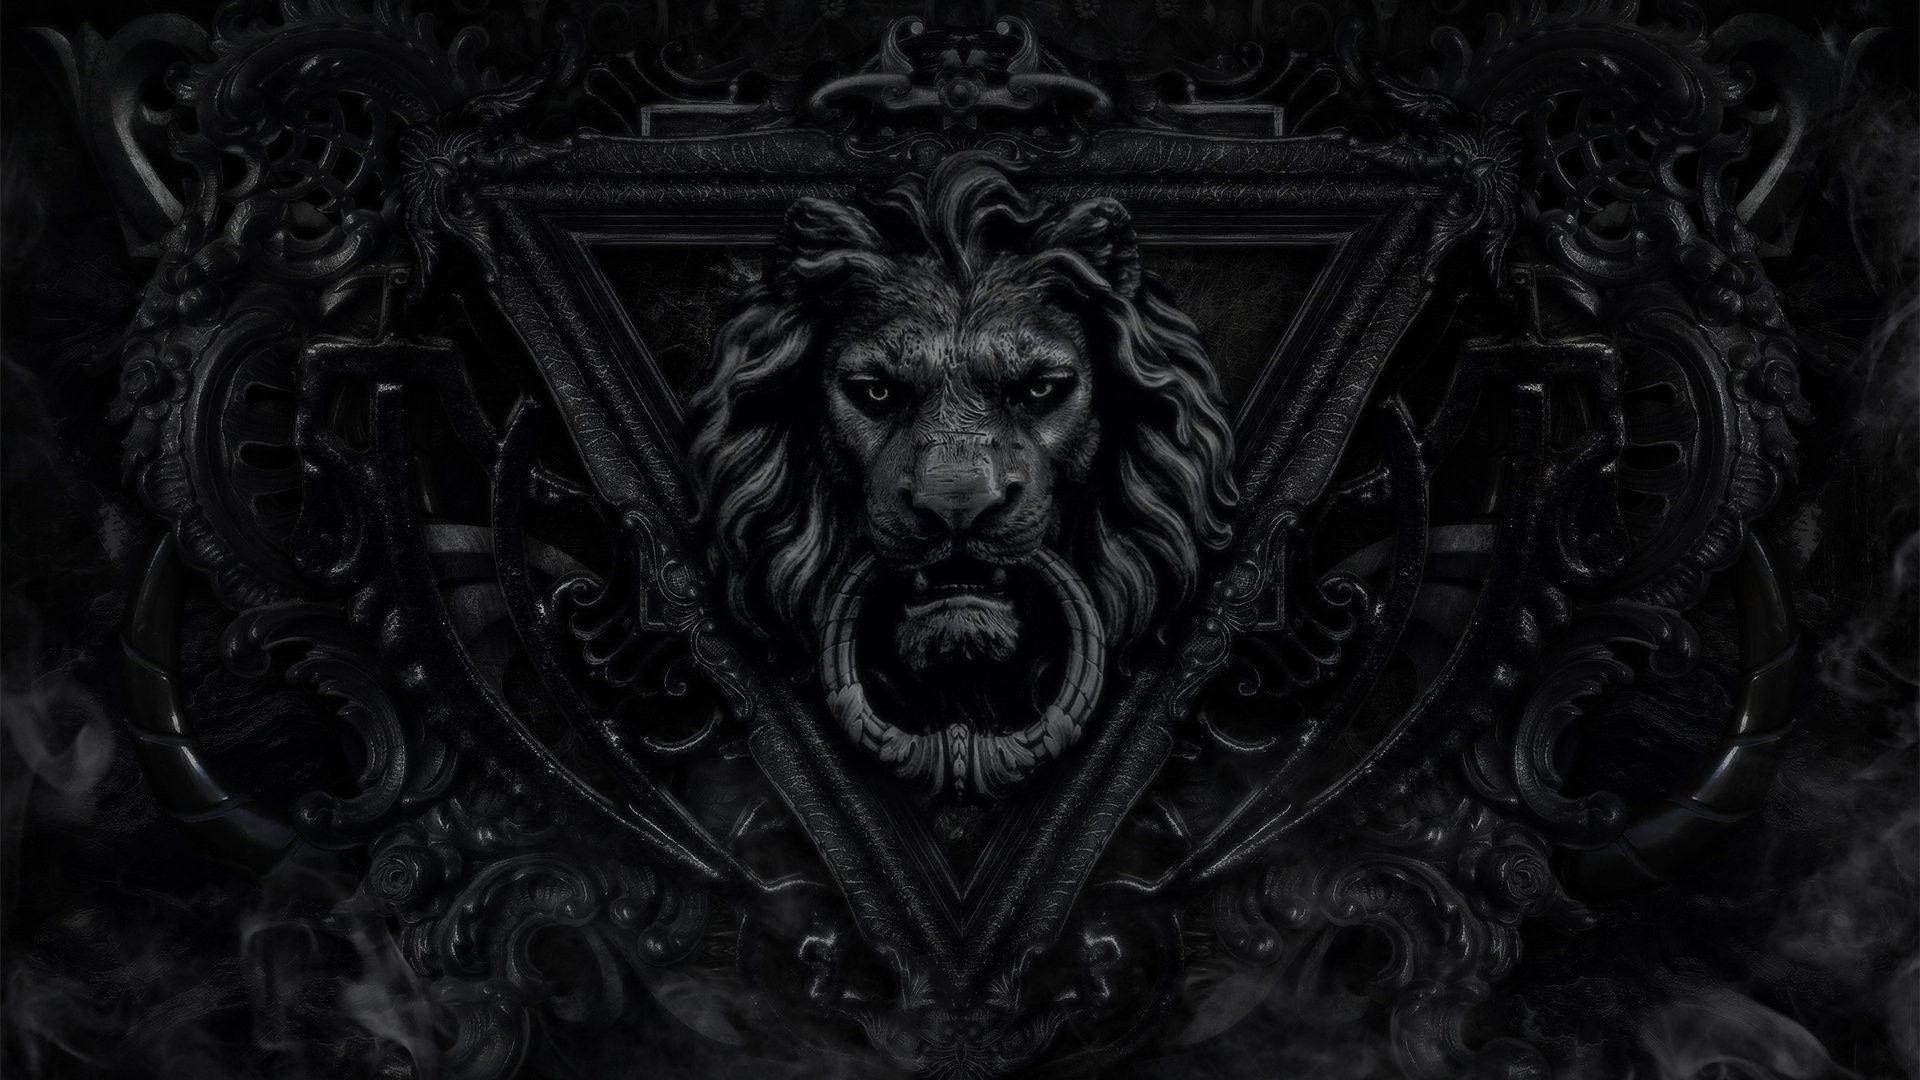 Lion Art hd wallpaper 1080